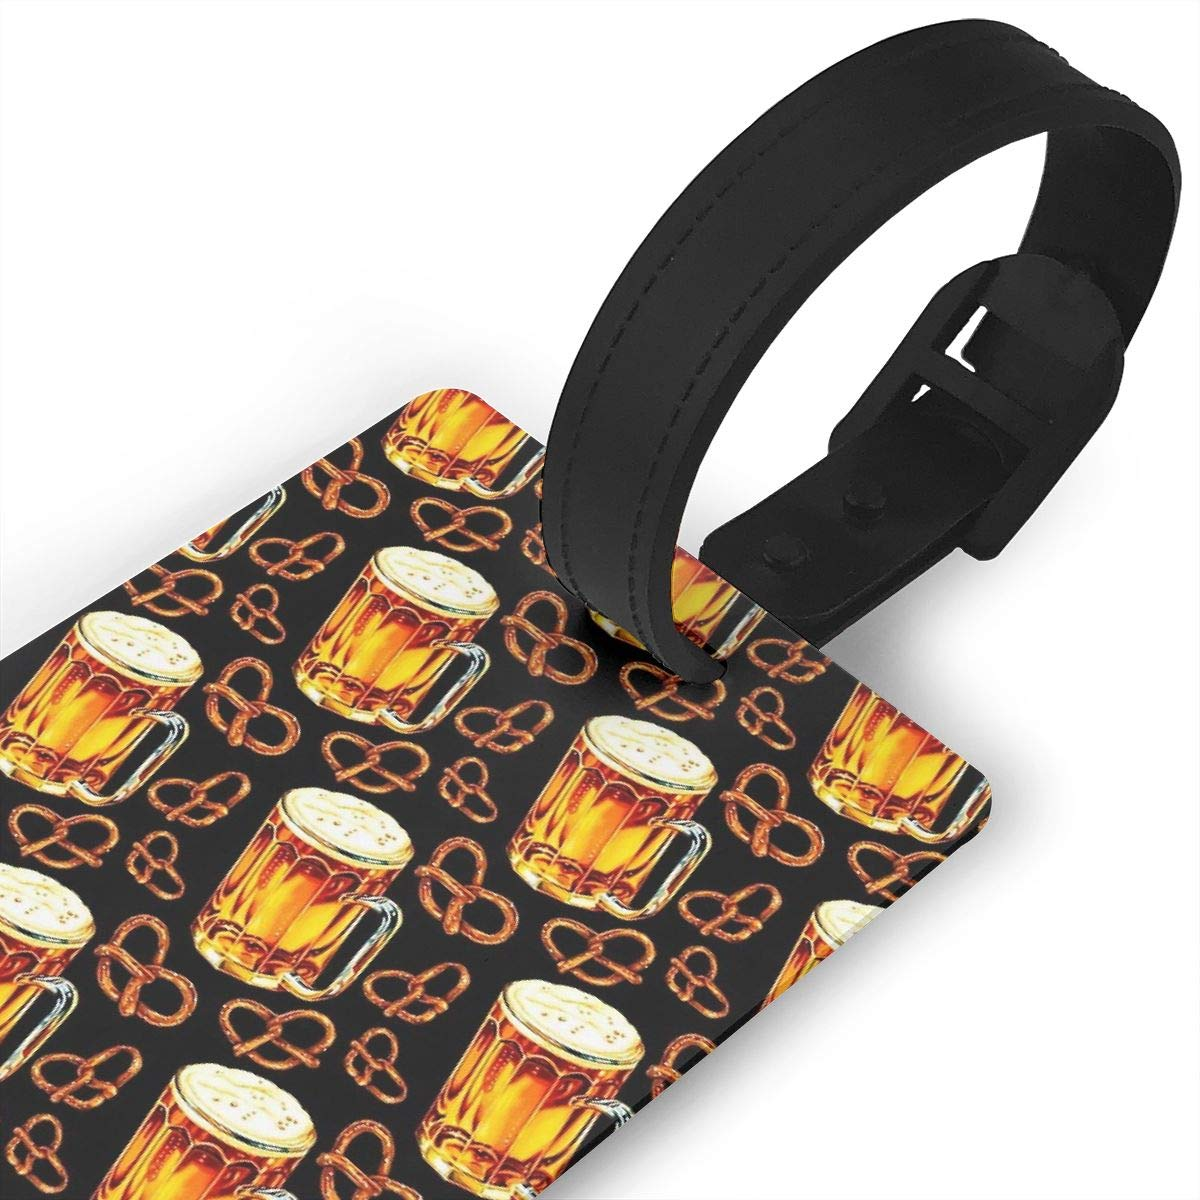 Set of 2 Beer Lamp Pretzel Pattern Black Luggage Tags Suitcase Labels Bag Travel Accessories